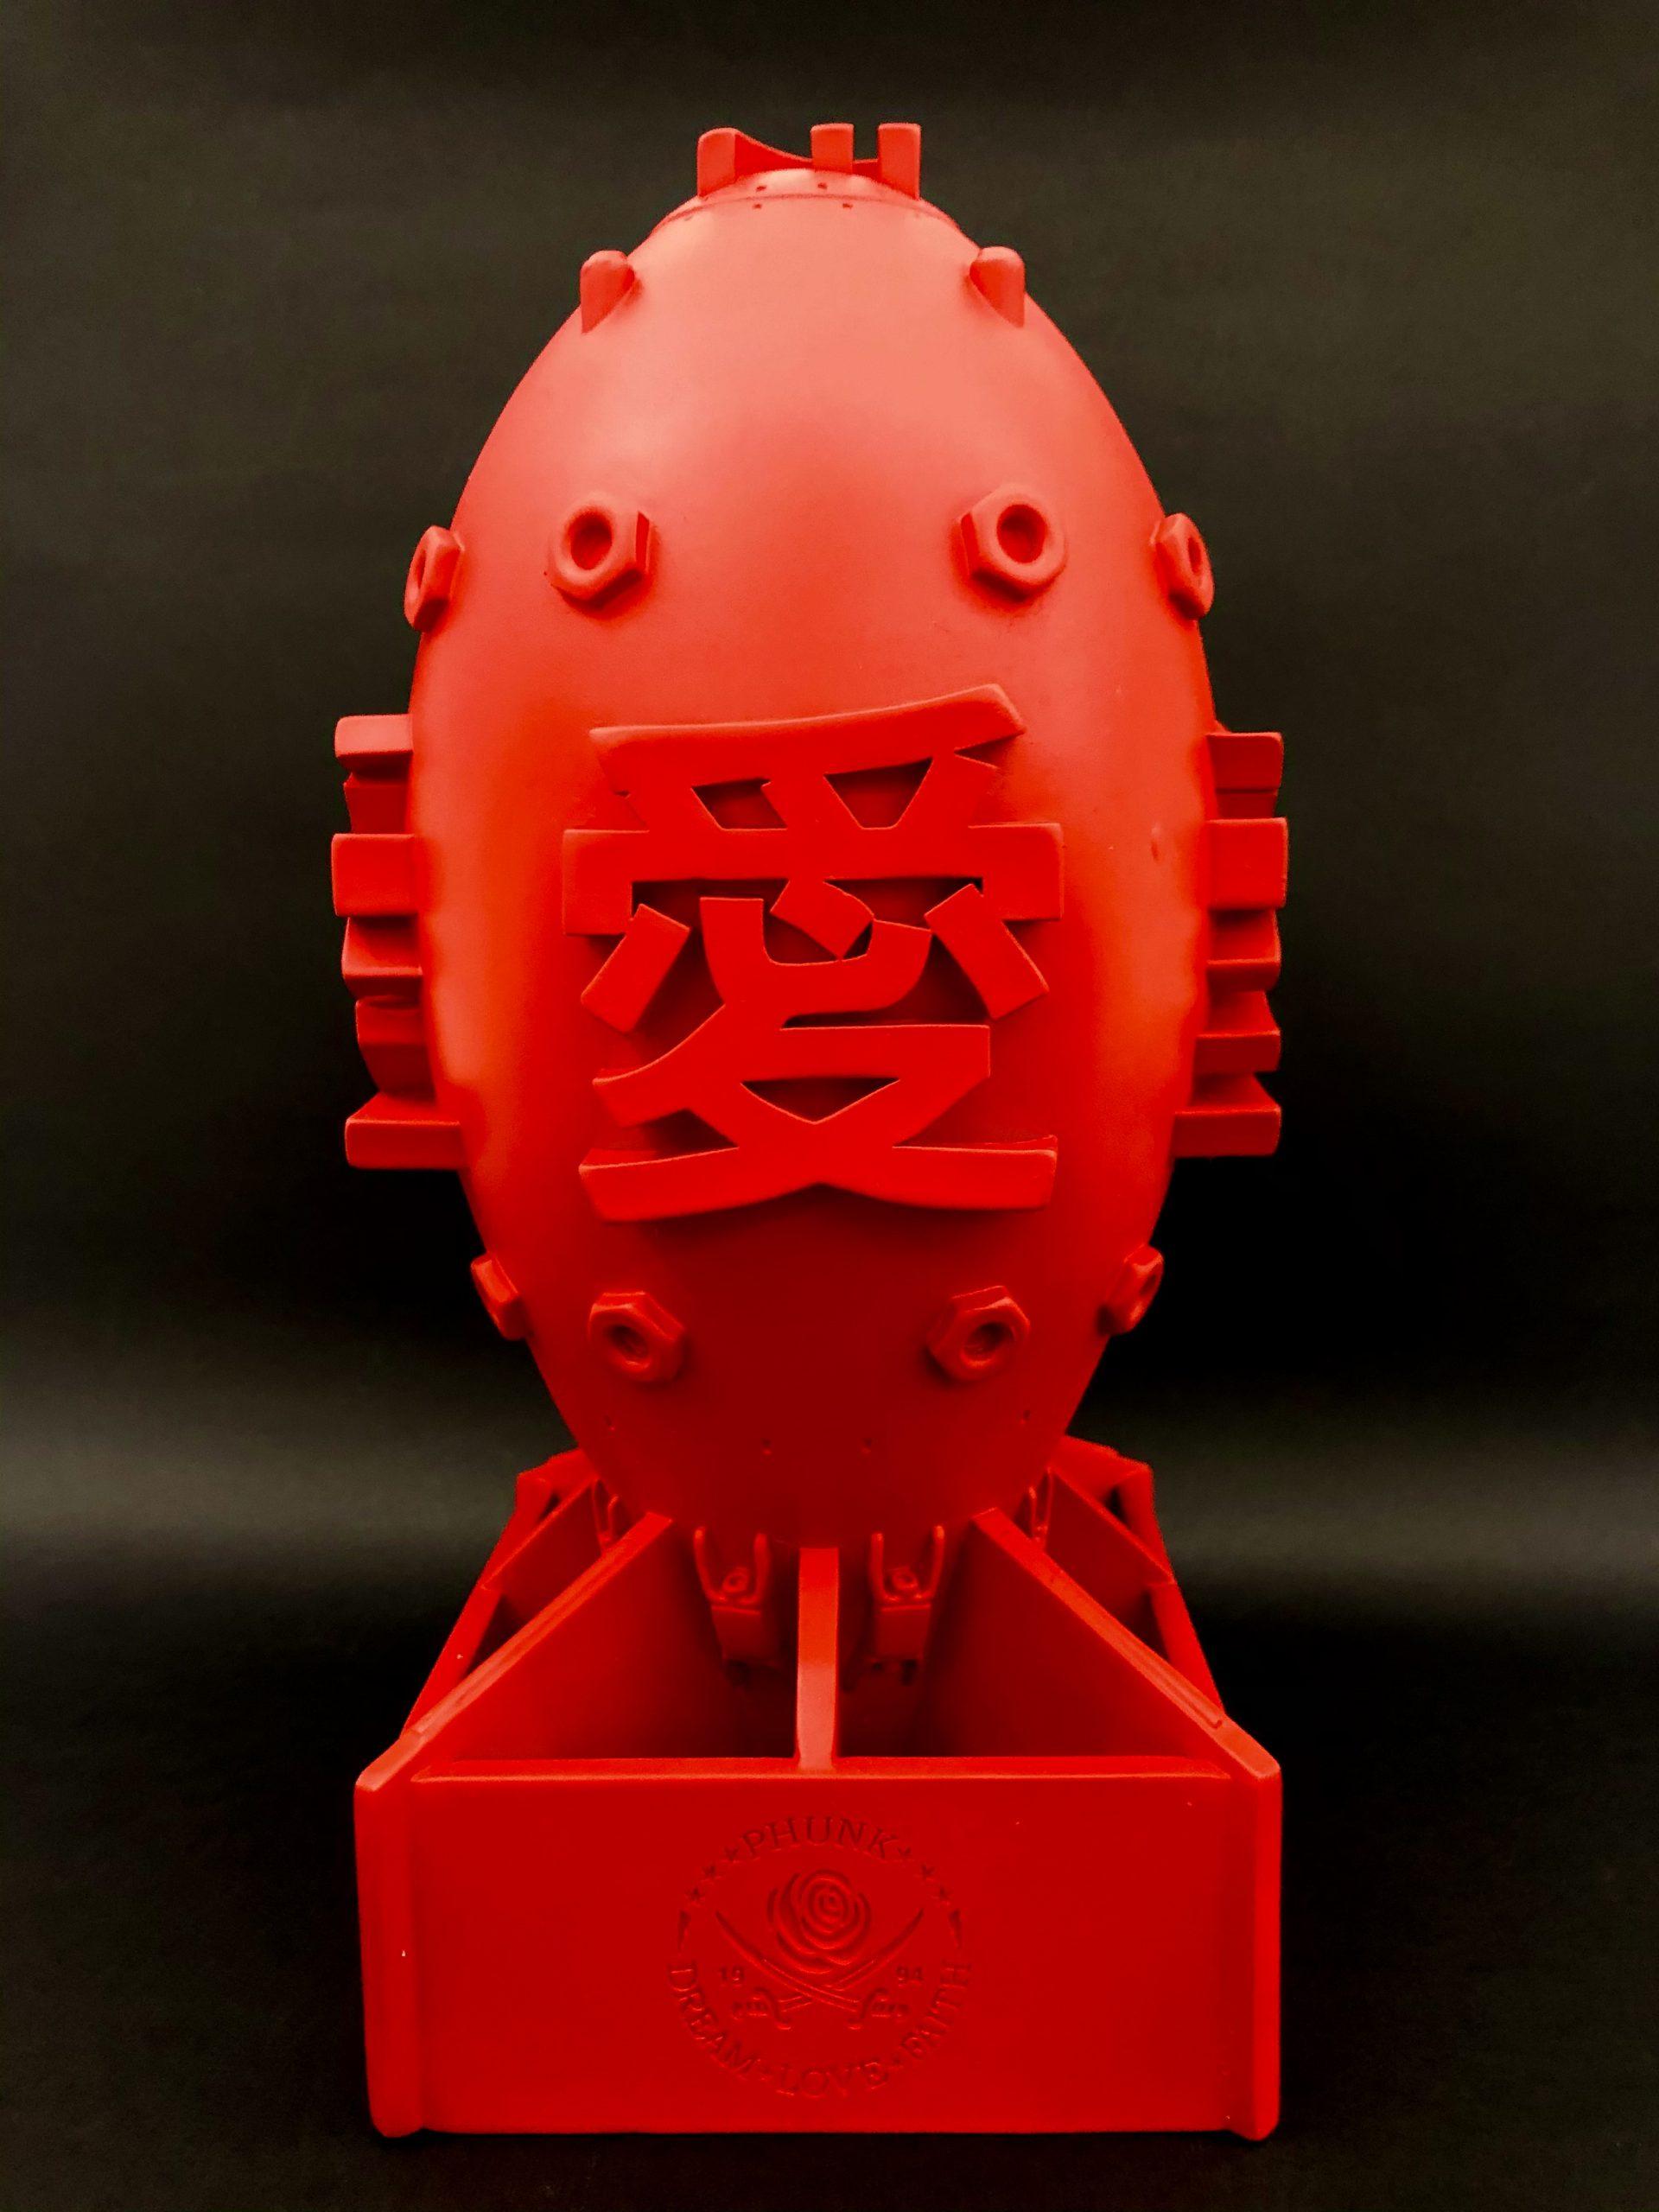 Love Bomb in Red (aka Fat Boy)